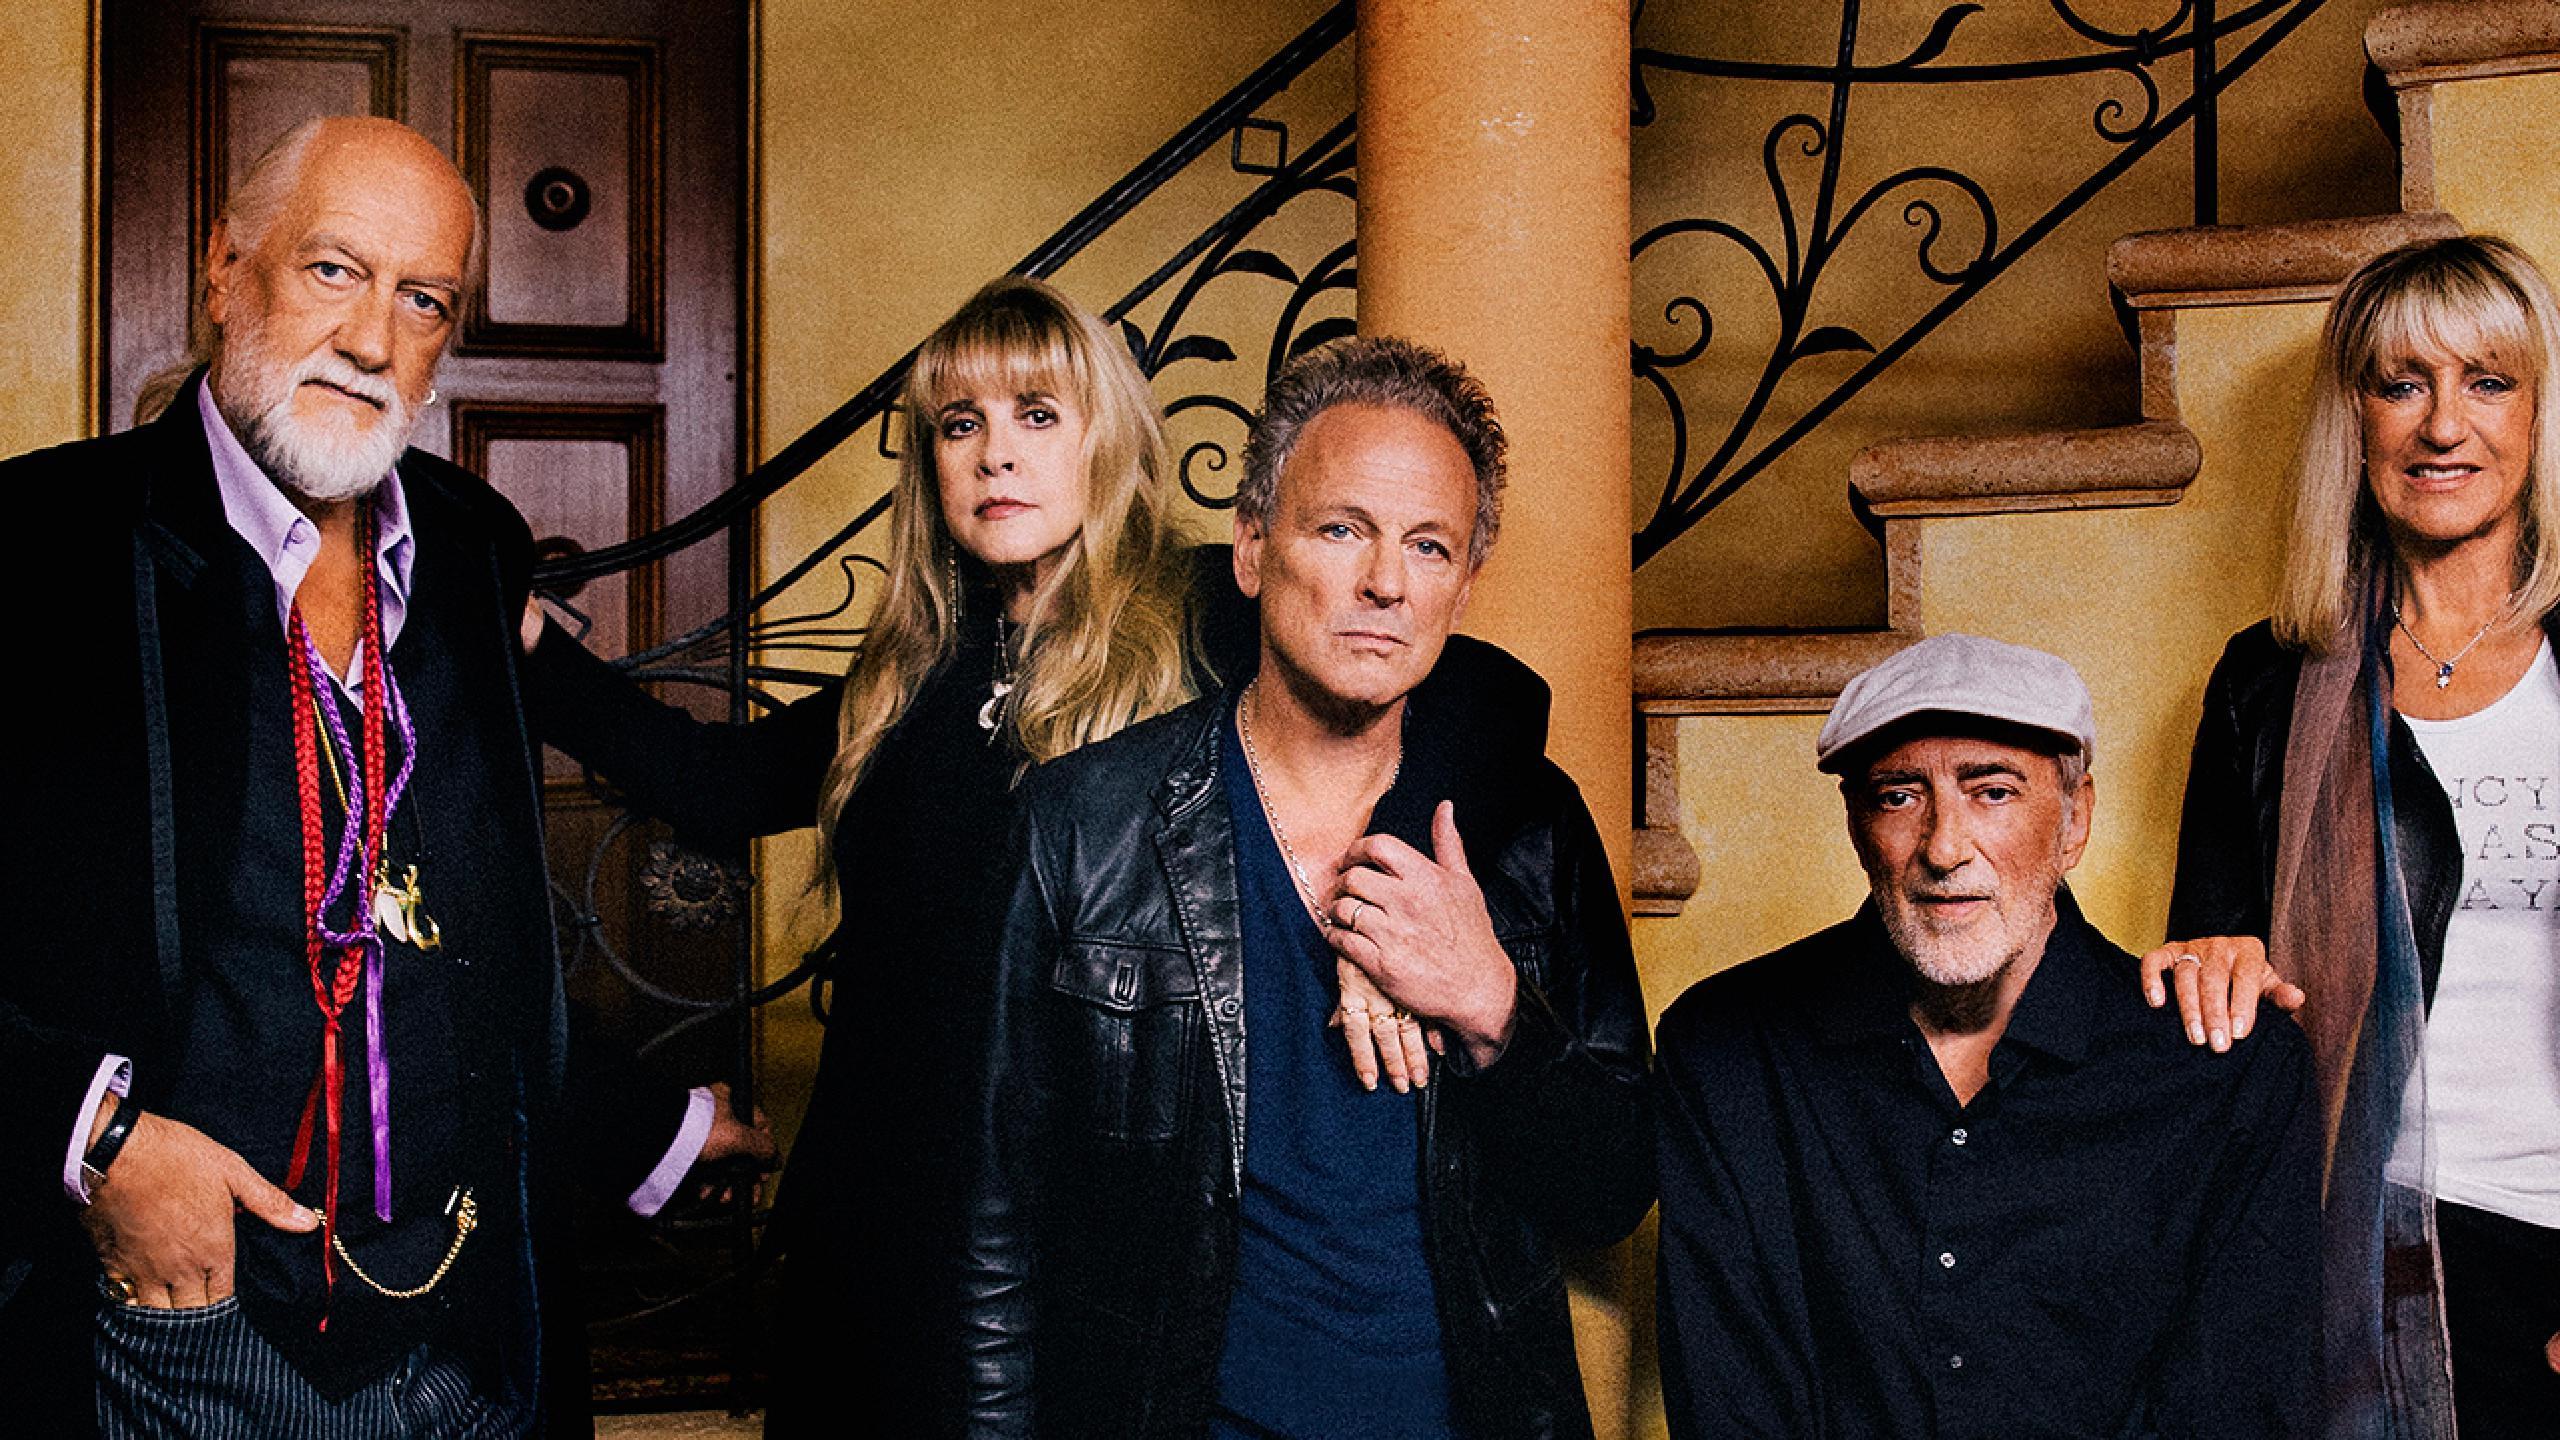 Fleetwood Mac Tour 2020.Fleetwood Mac Tour Dates 2019 2020 Fleetwood Mac Tickets